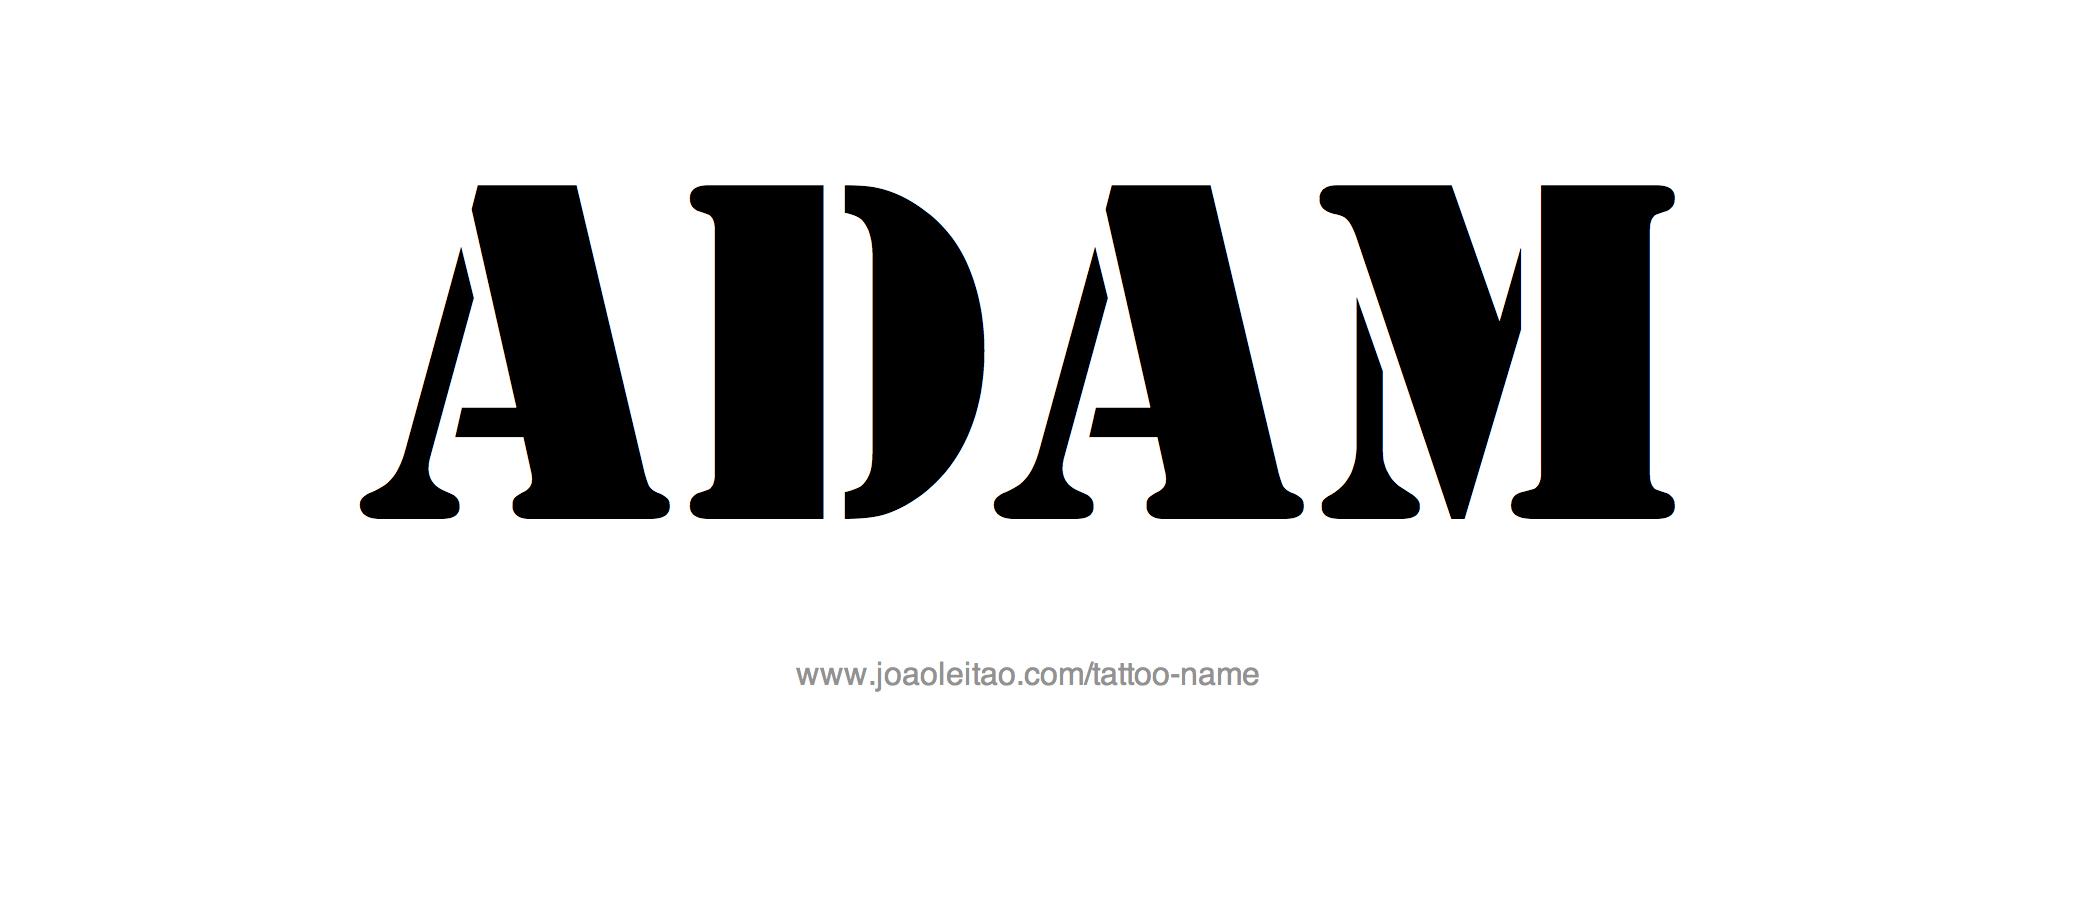 Name: Adam Name Tattoo Designs